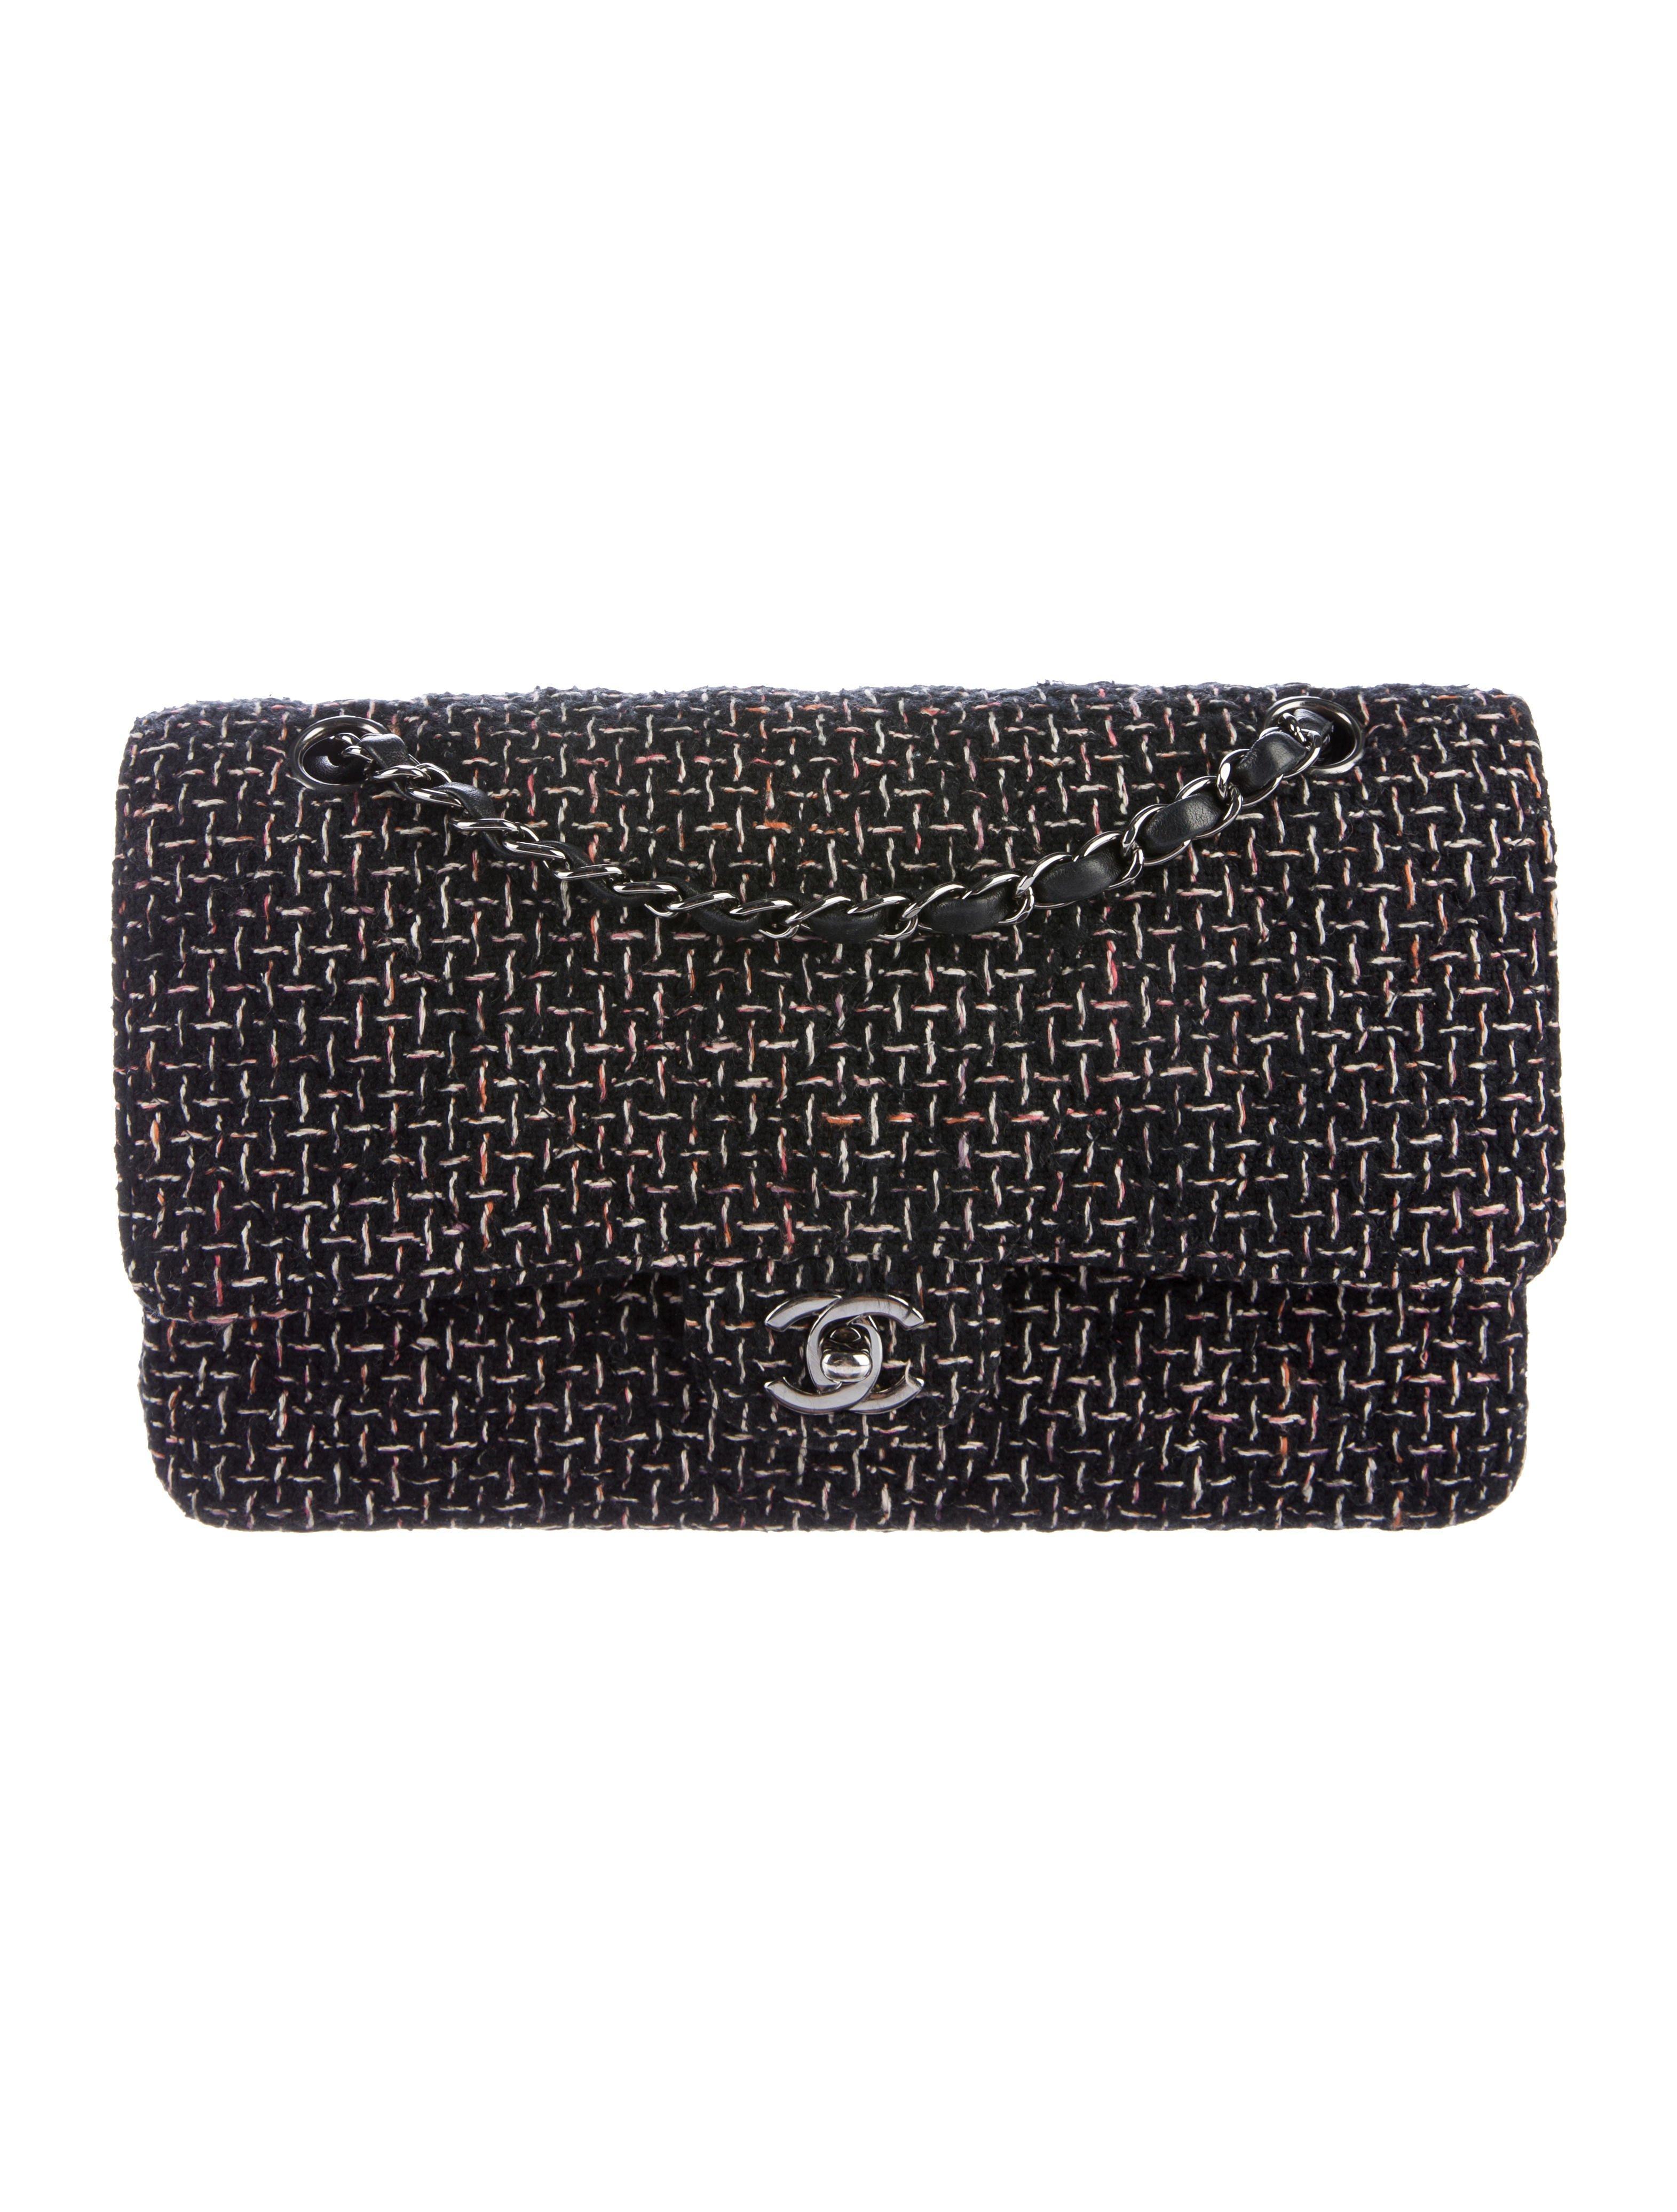 cb84adb7ff53 Lyst - Chanel Quilted Medium Tweed Double Flap Bag Black in Metallic